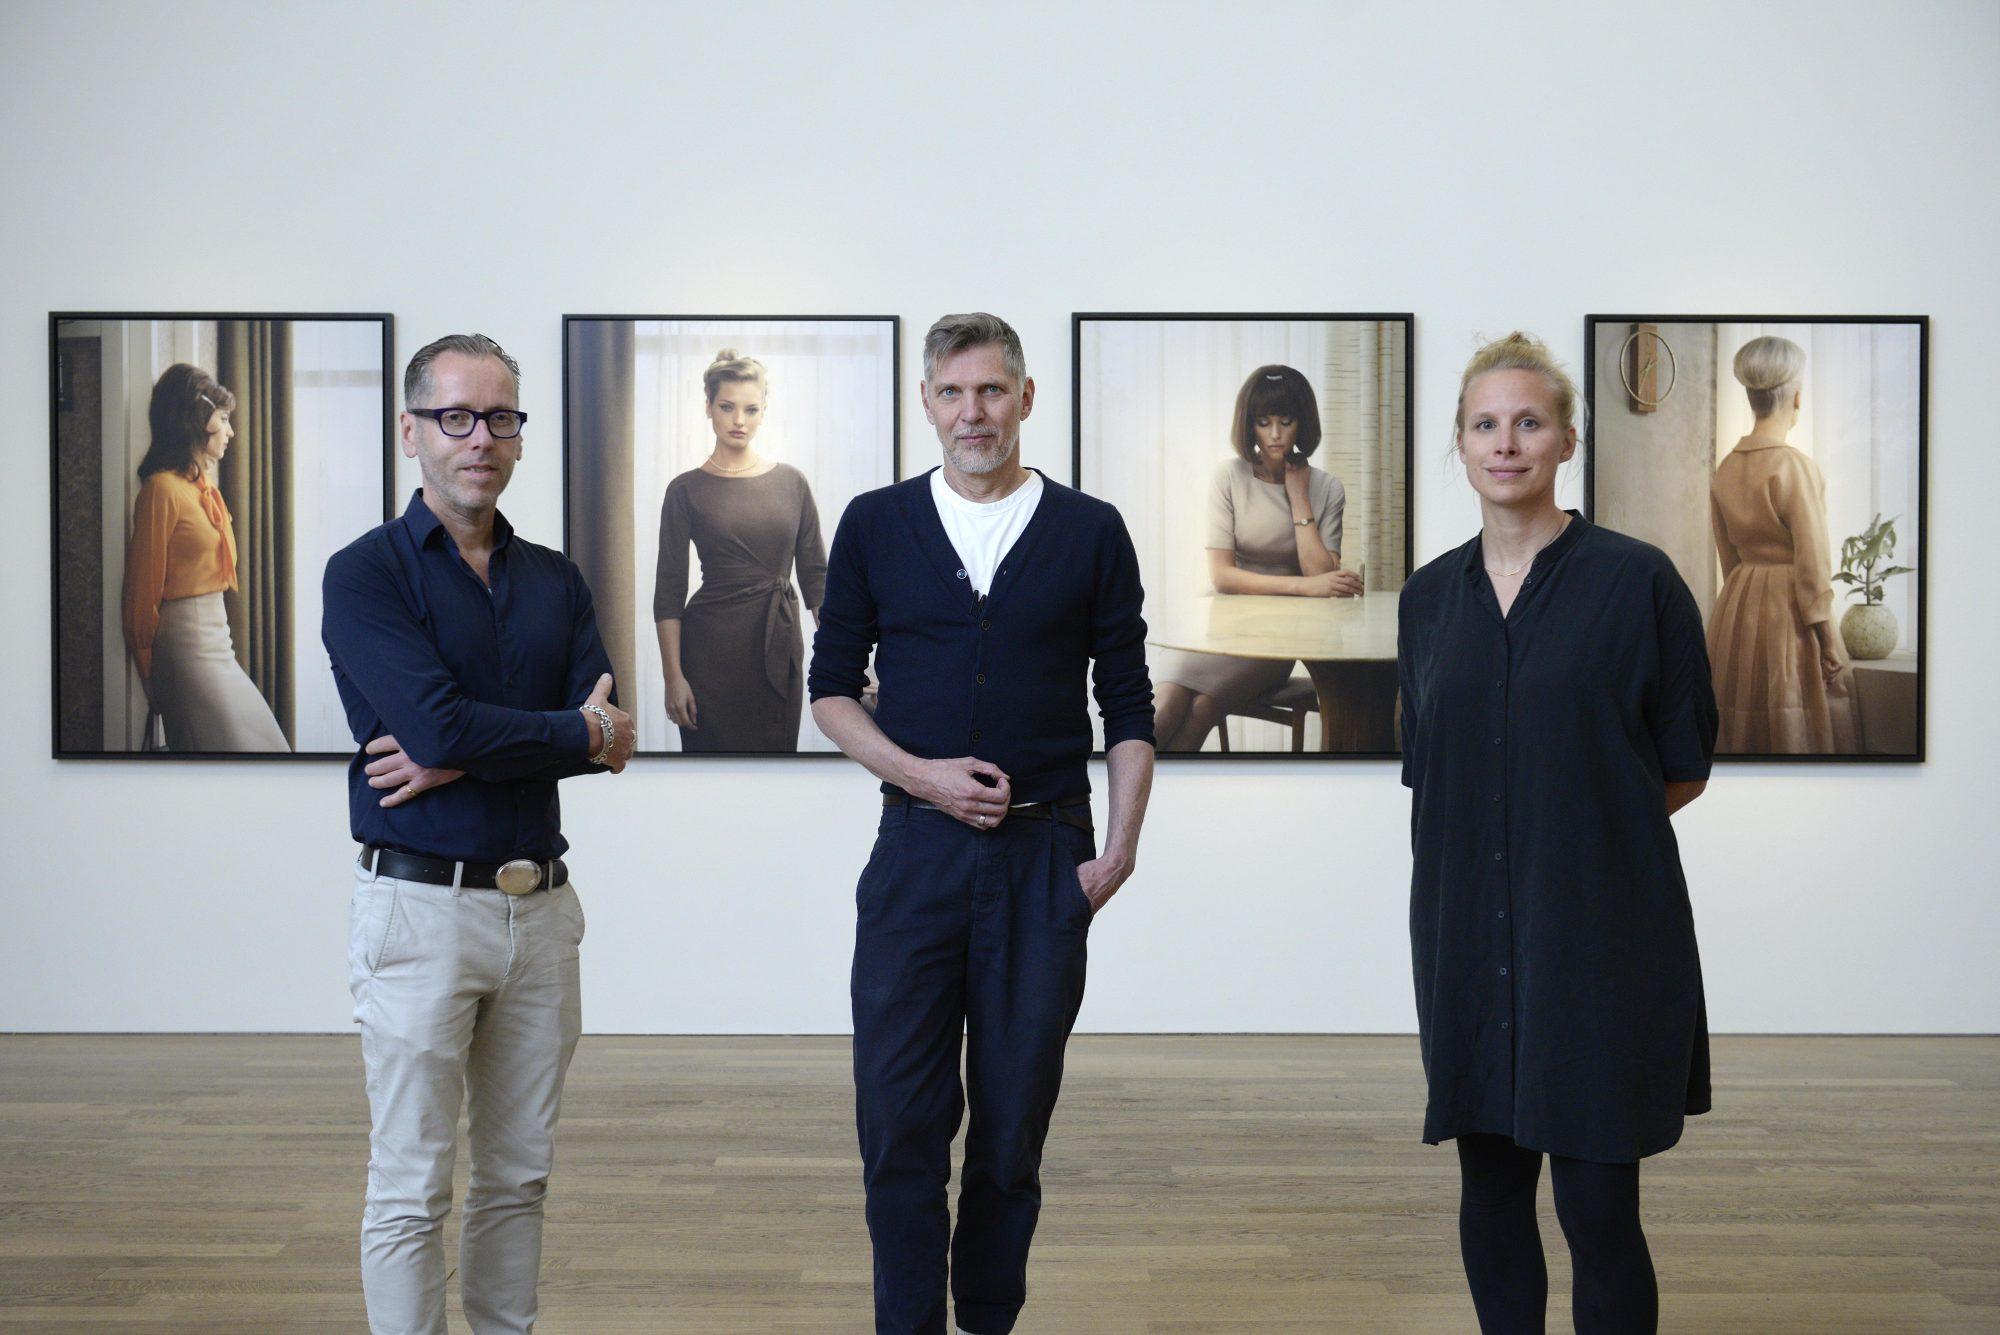 Upcoming: RM Sunday Session | Exploration Kunsthalle Munich